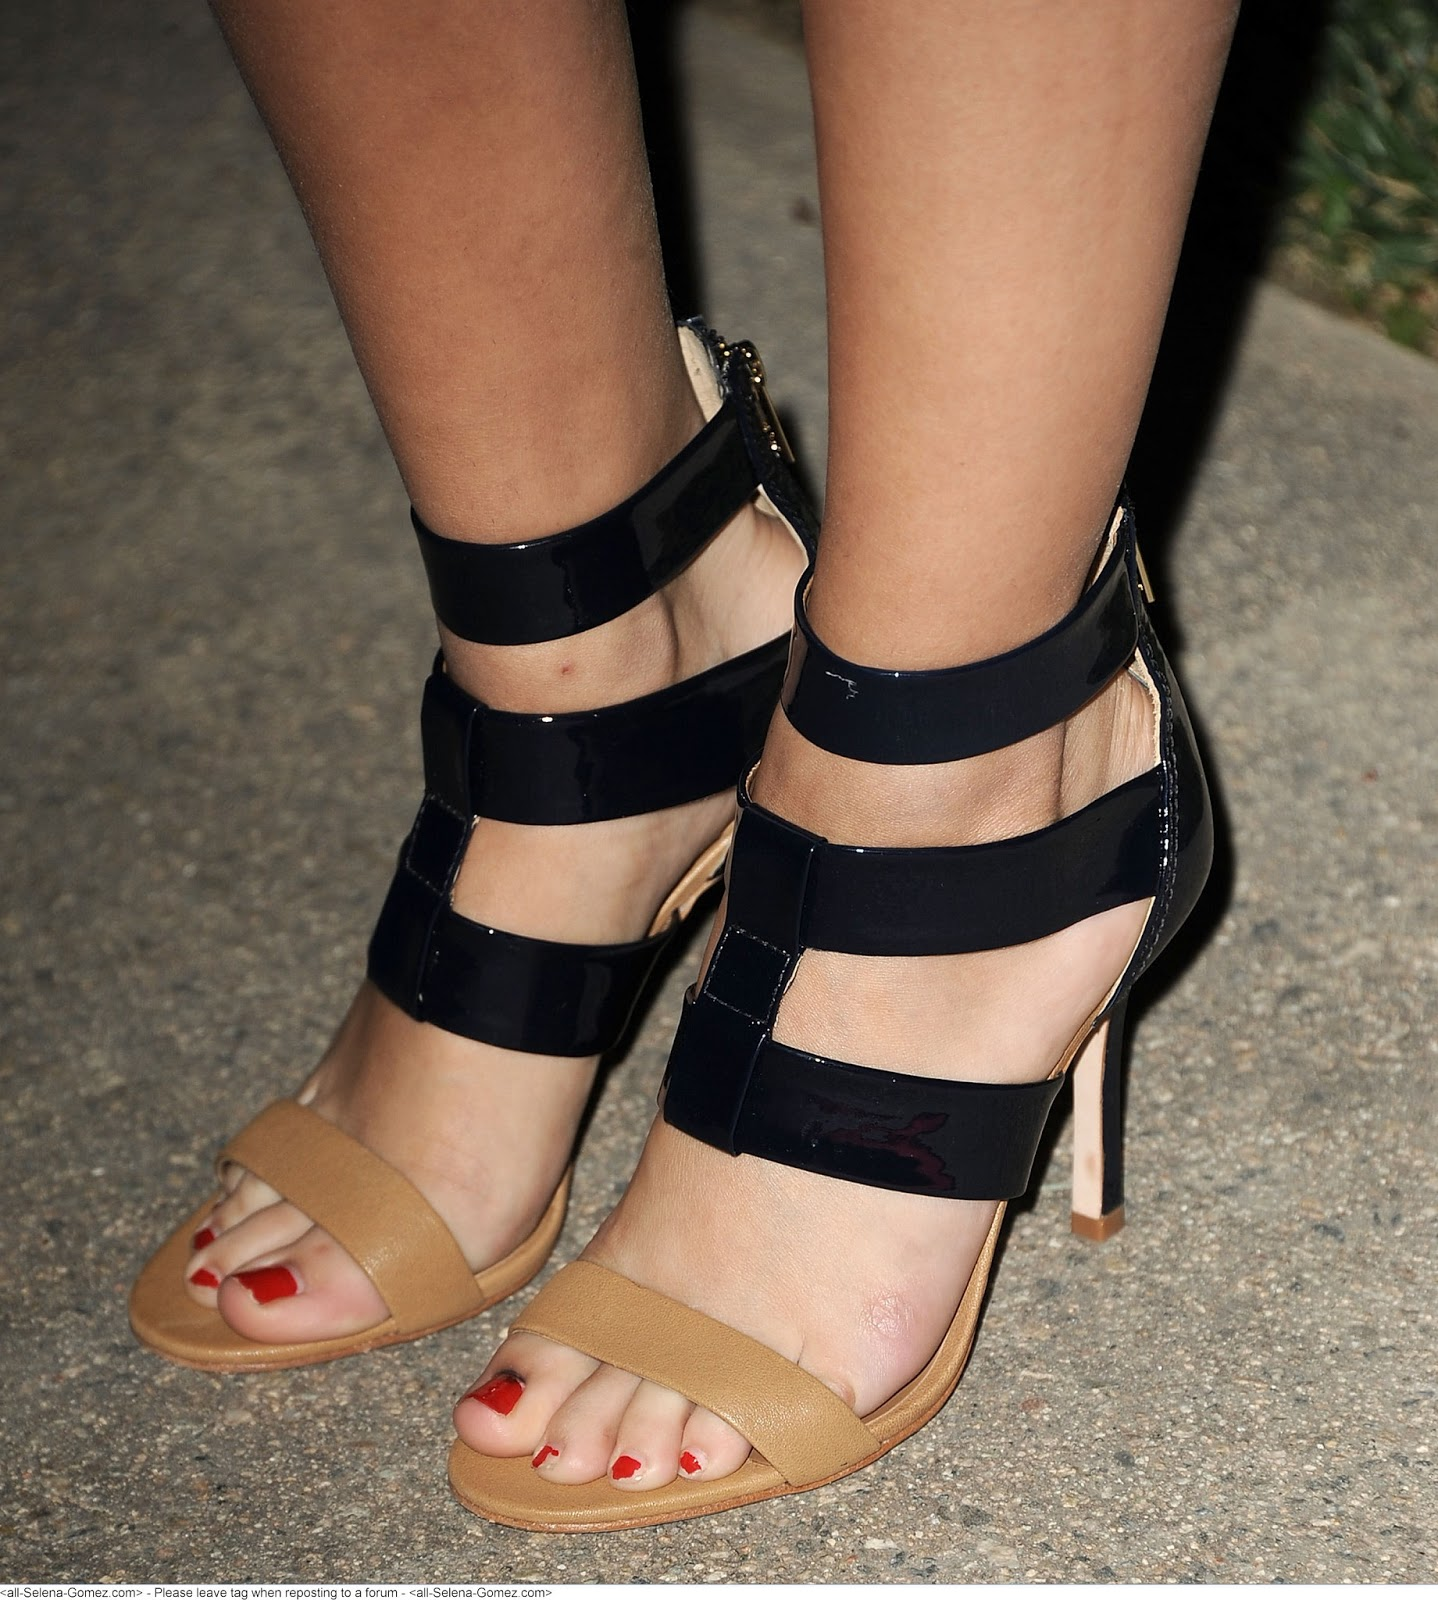 Selena Gomez hd feet photos sexy feet capture - celebrity